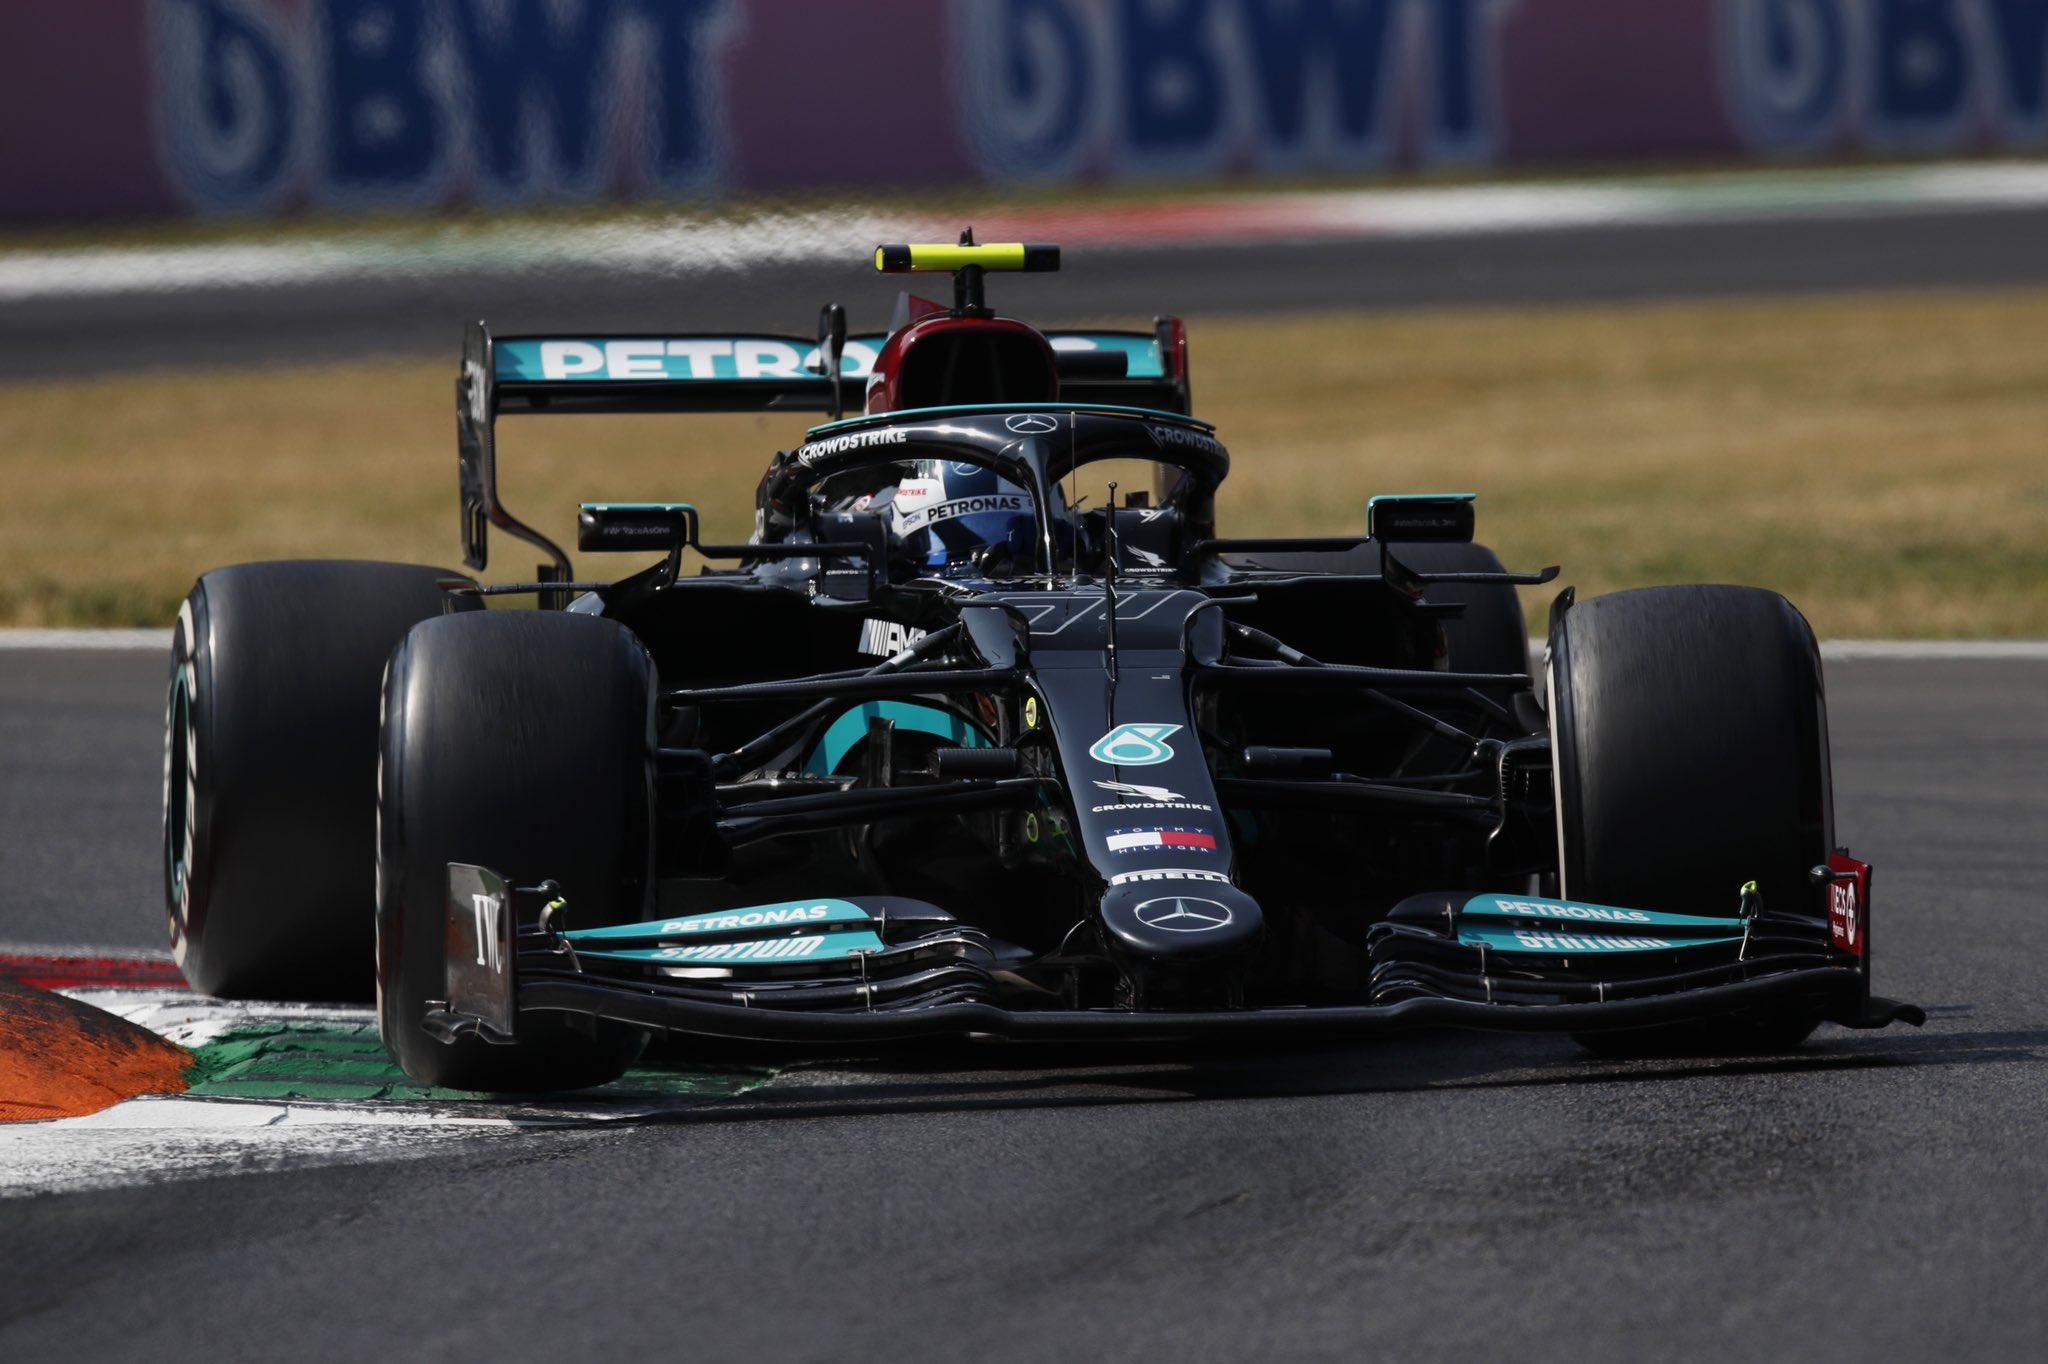 Bottas remporte la qualification sprint